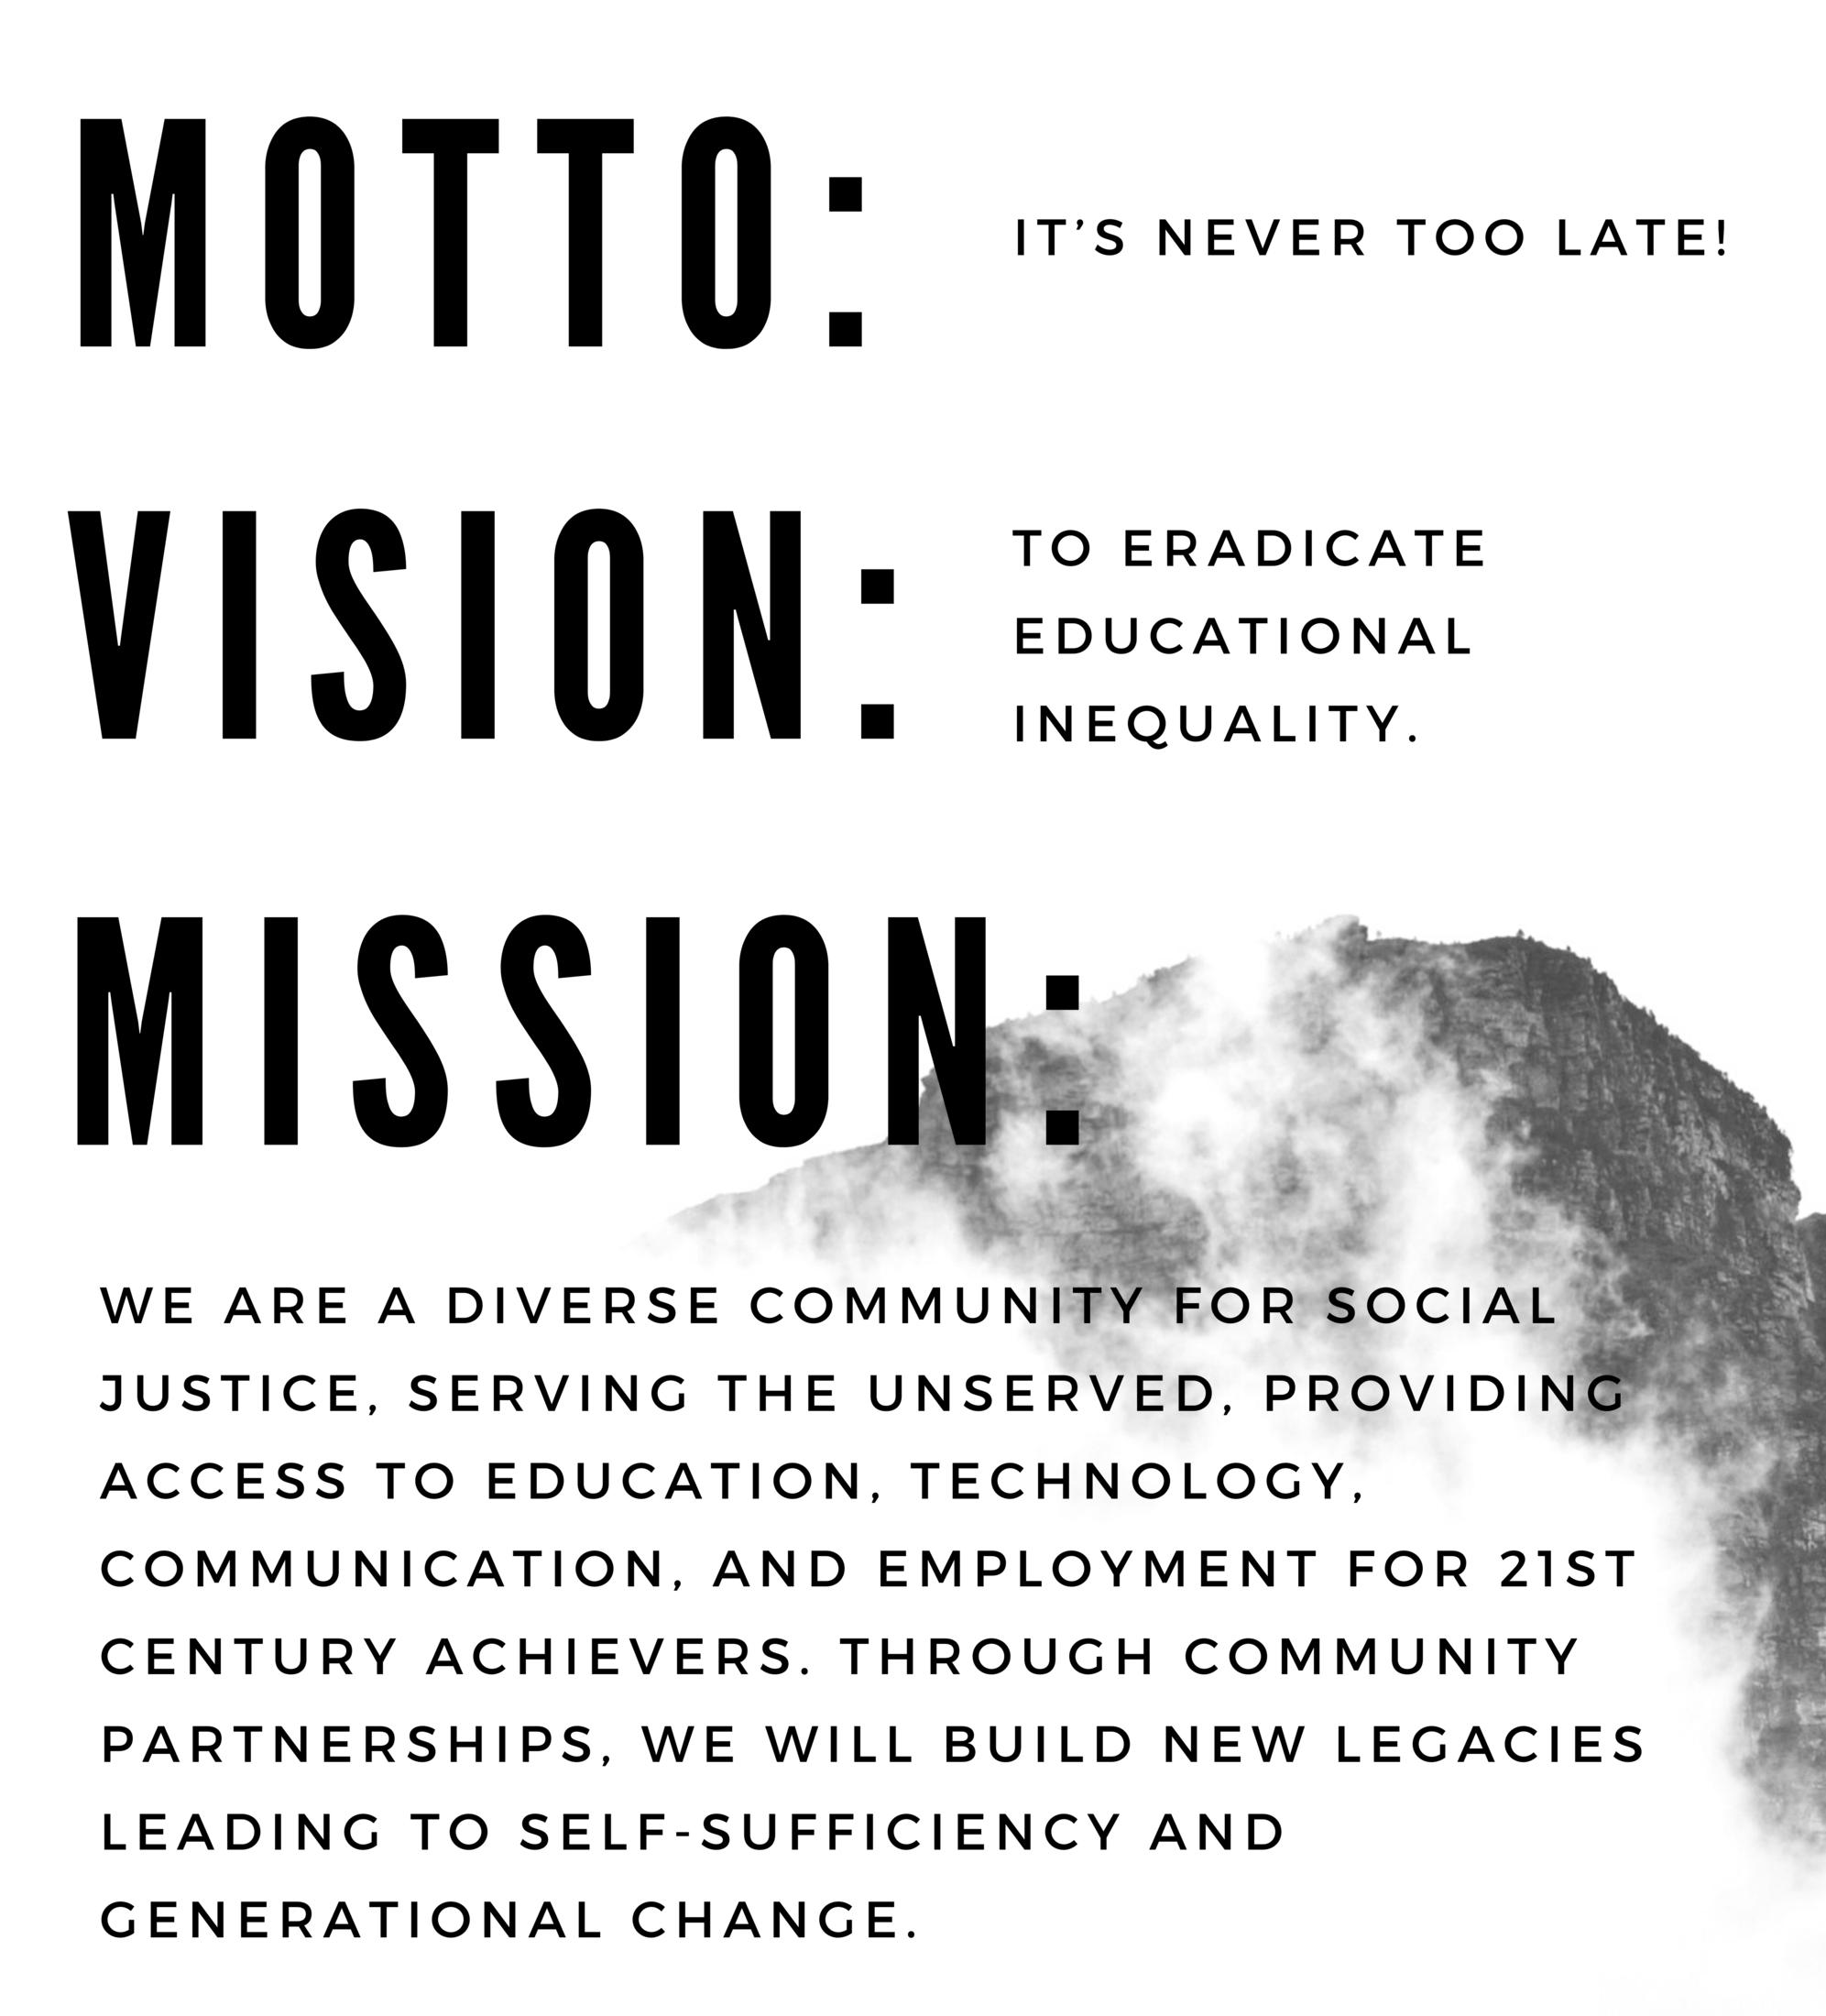 Motto, Mission, Vision